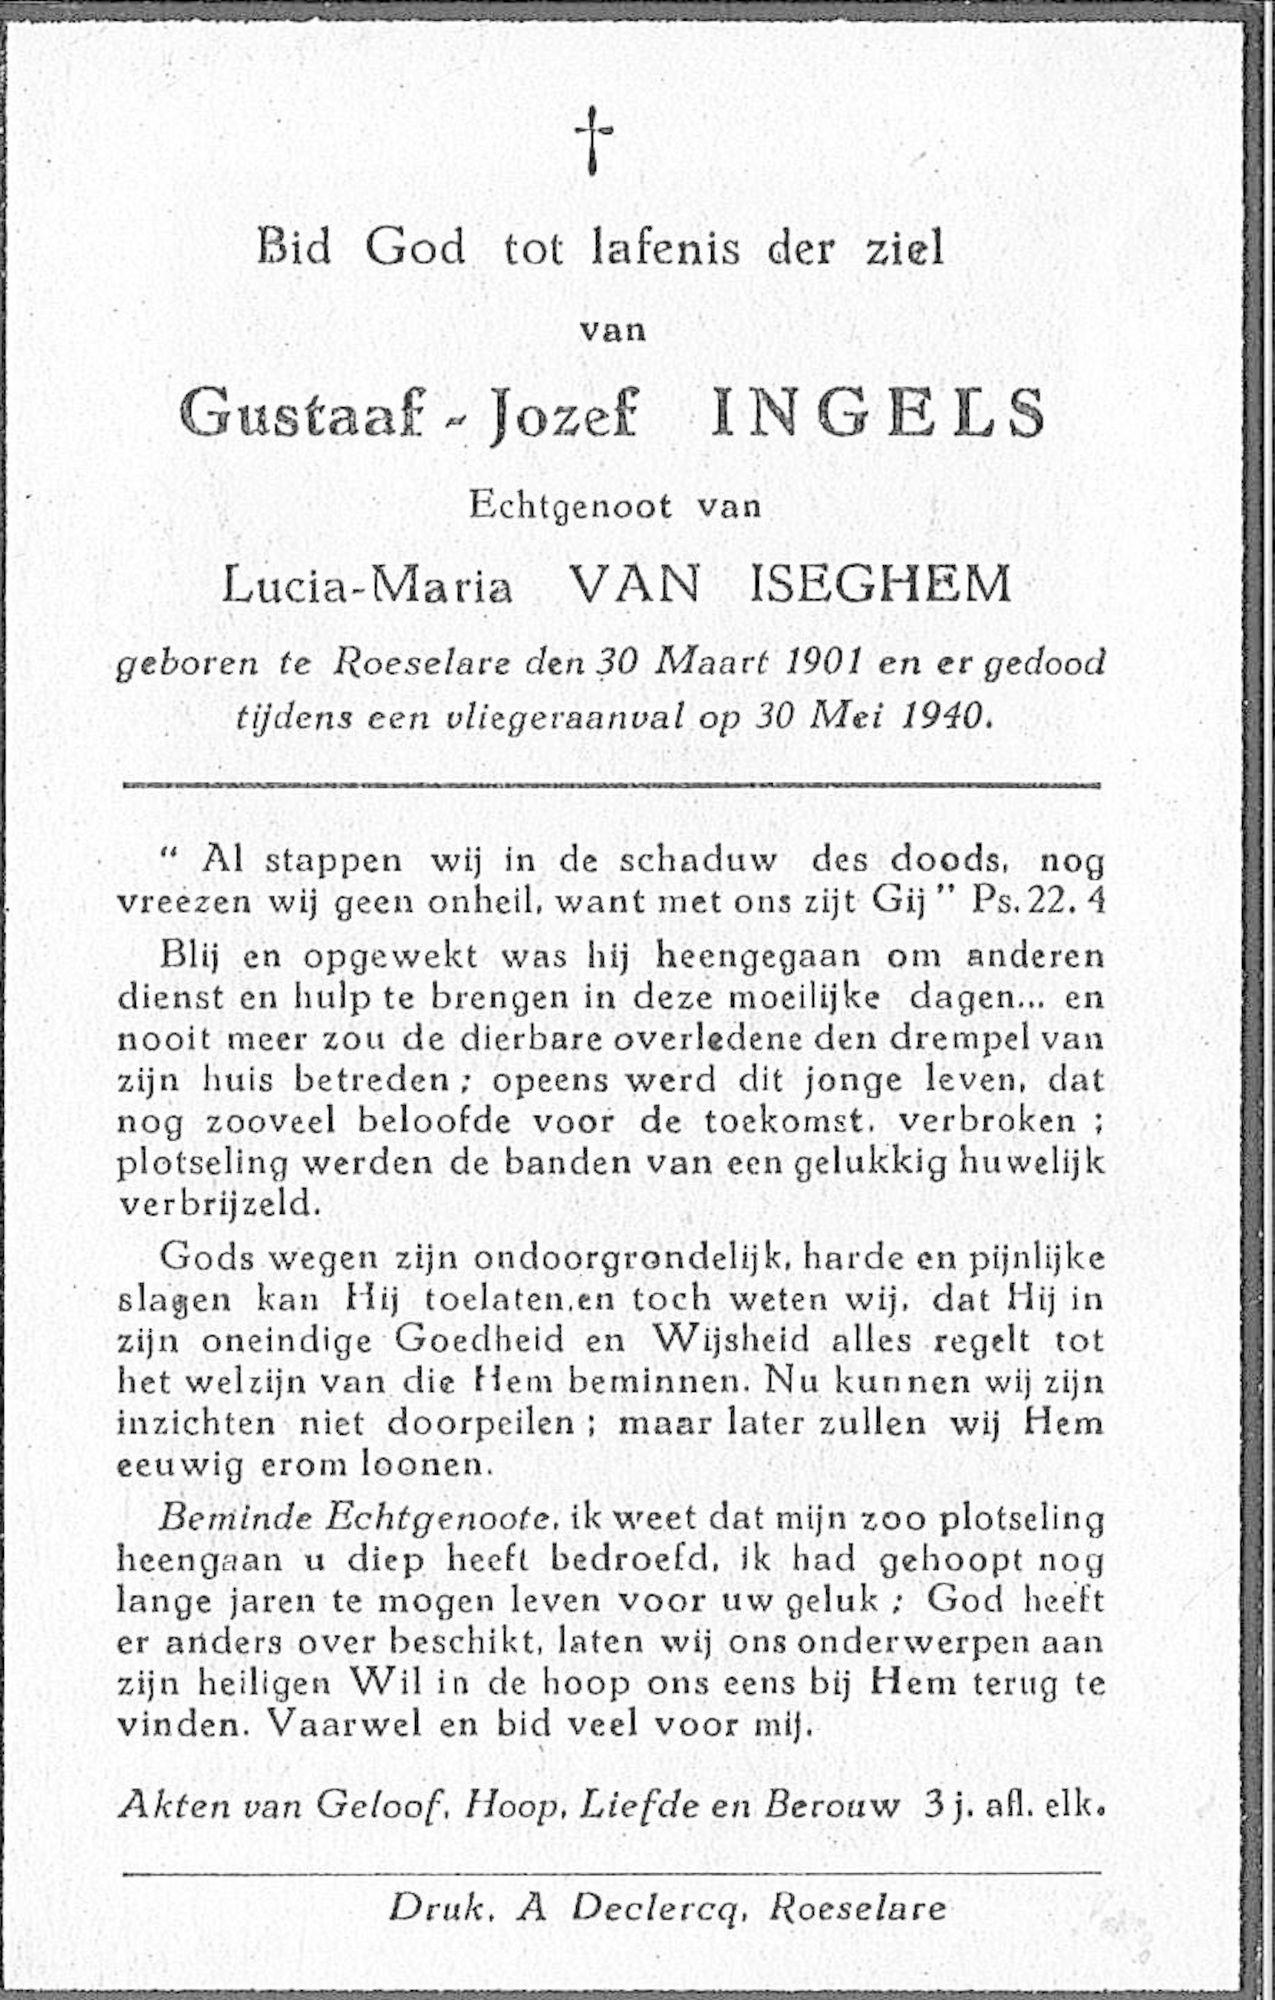 Gustaaf-Jozef Ingels